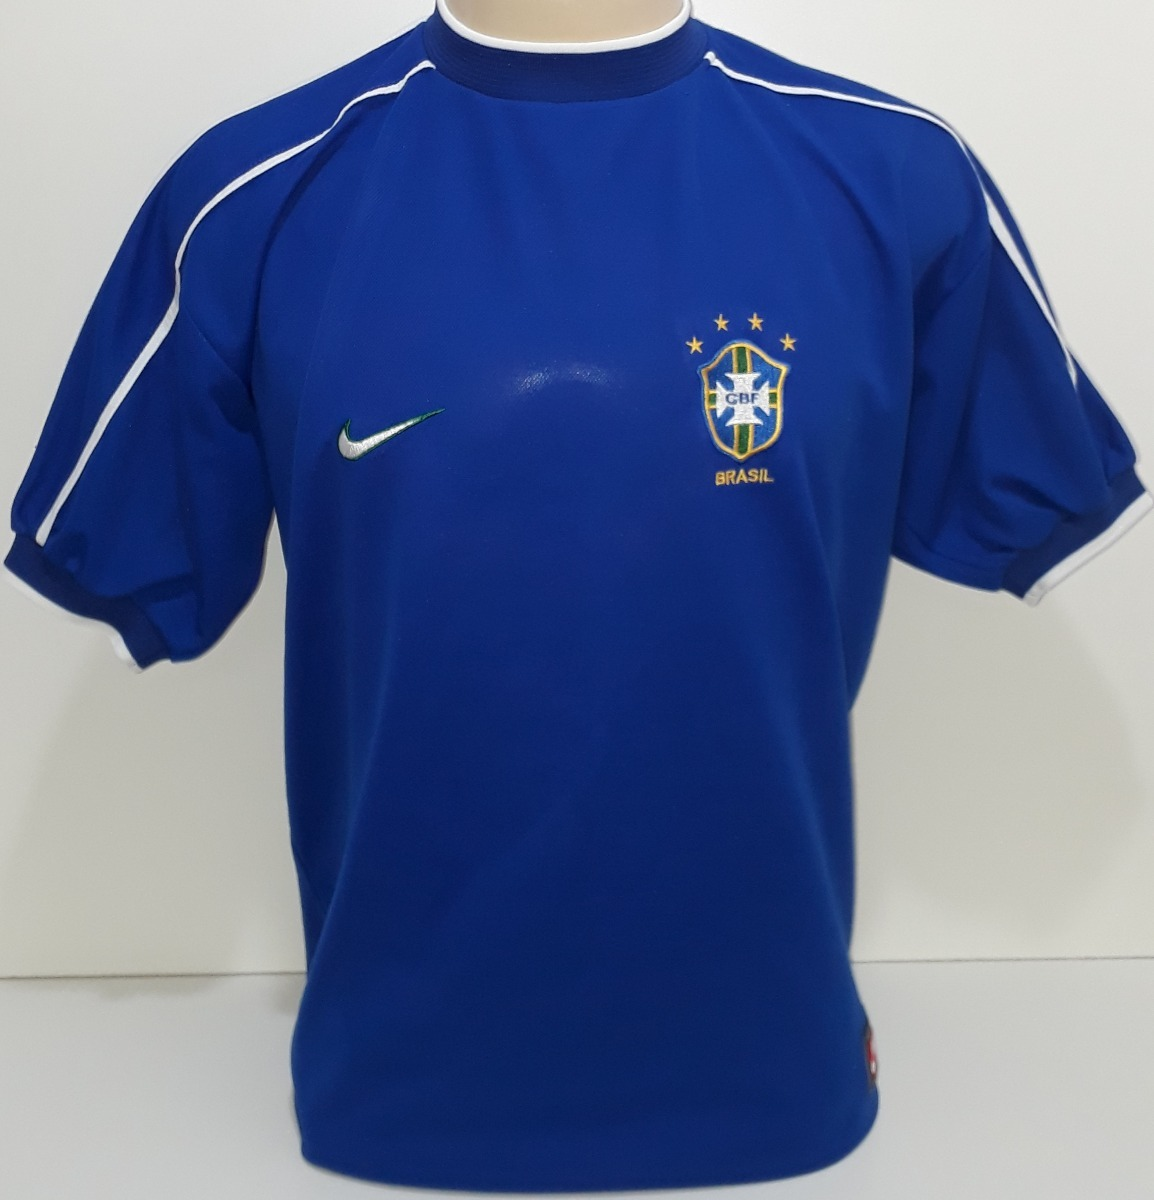 Lago taupo Sumamente elegante Estereotipo  Camiseta Brasil Azul Nike 1998 Orig Copa Da França - G9 - R$ 149 ...